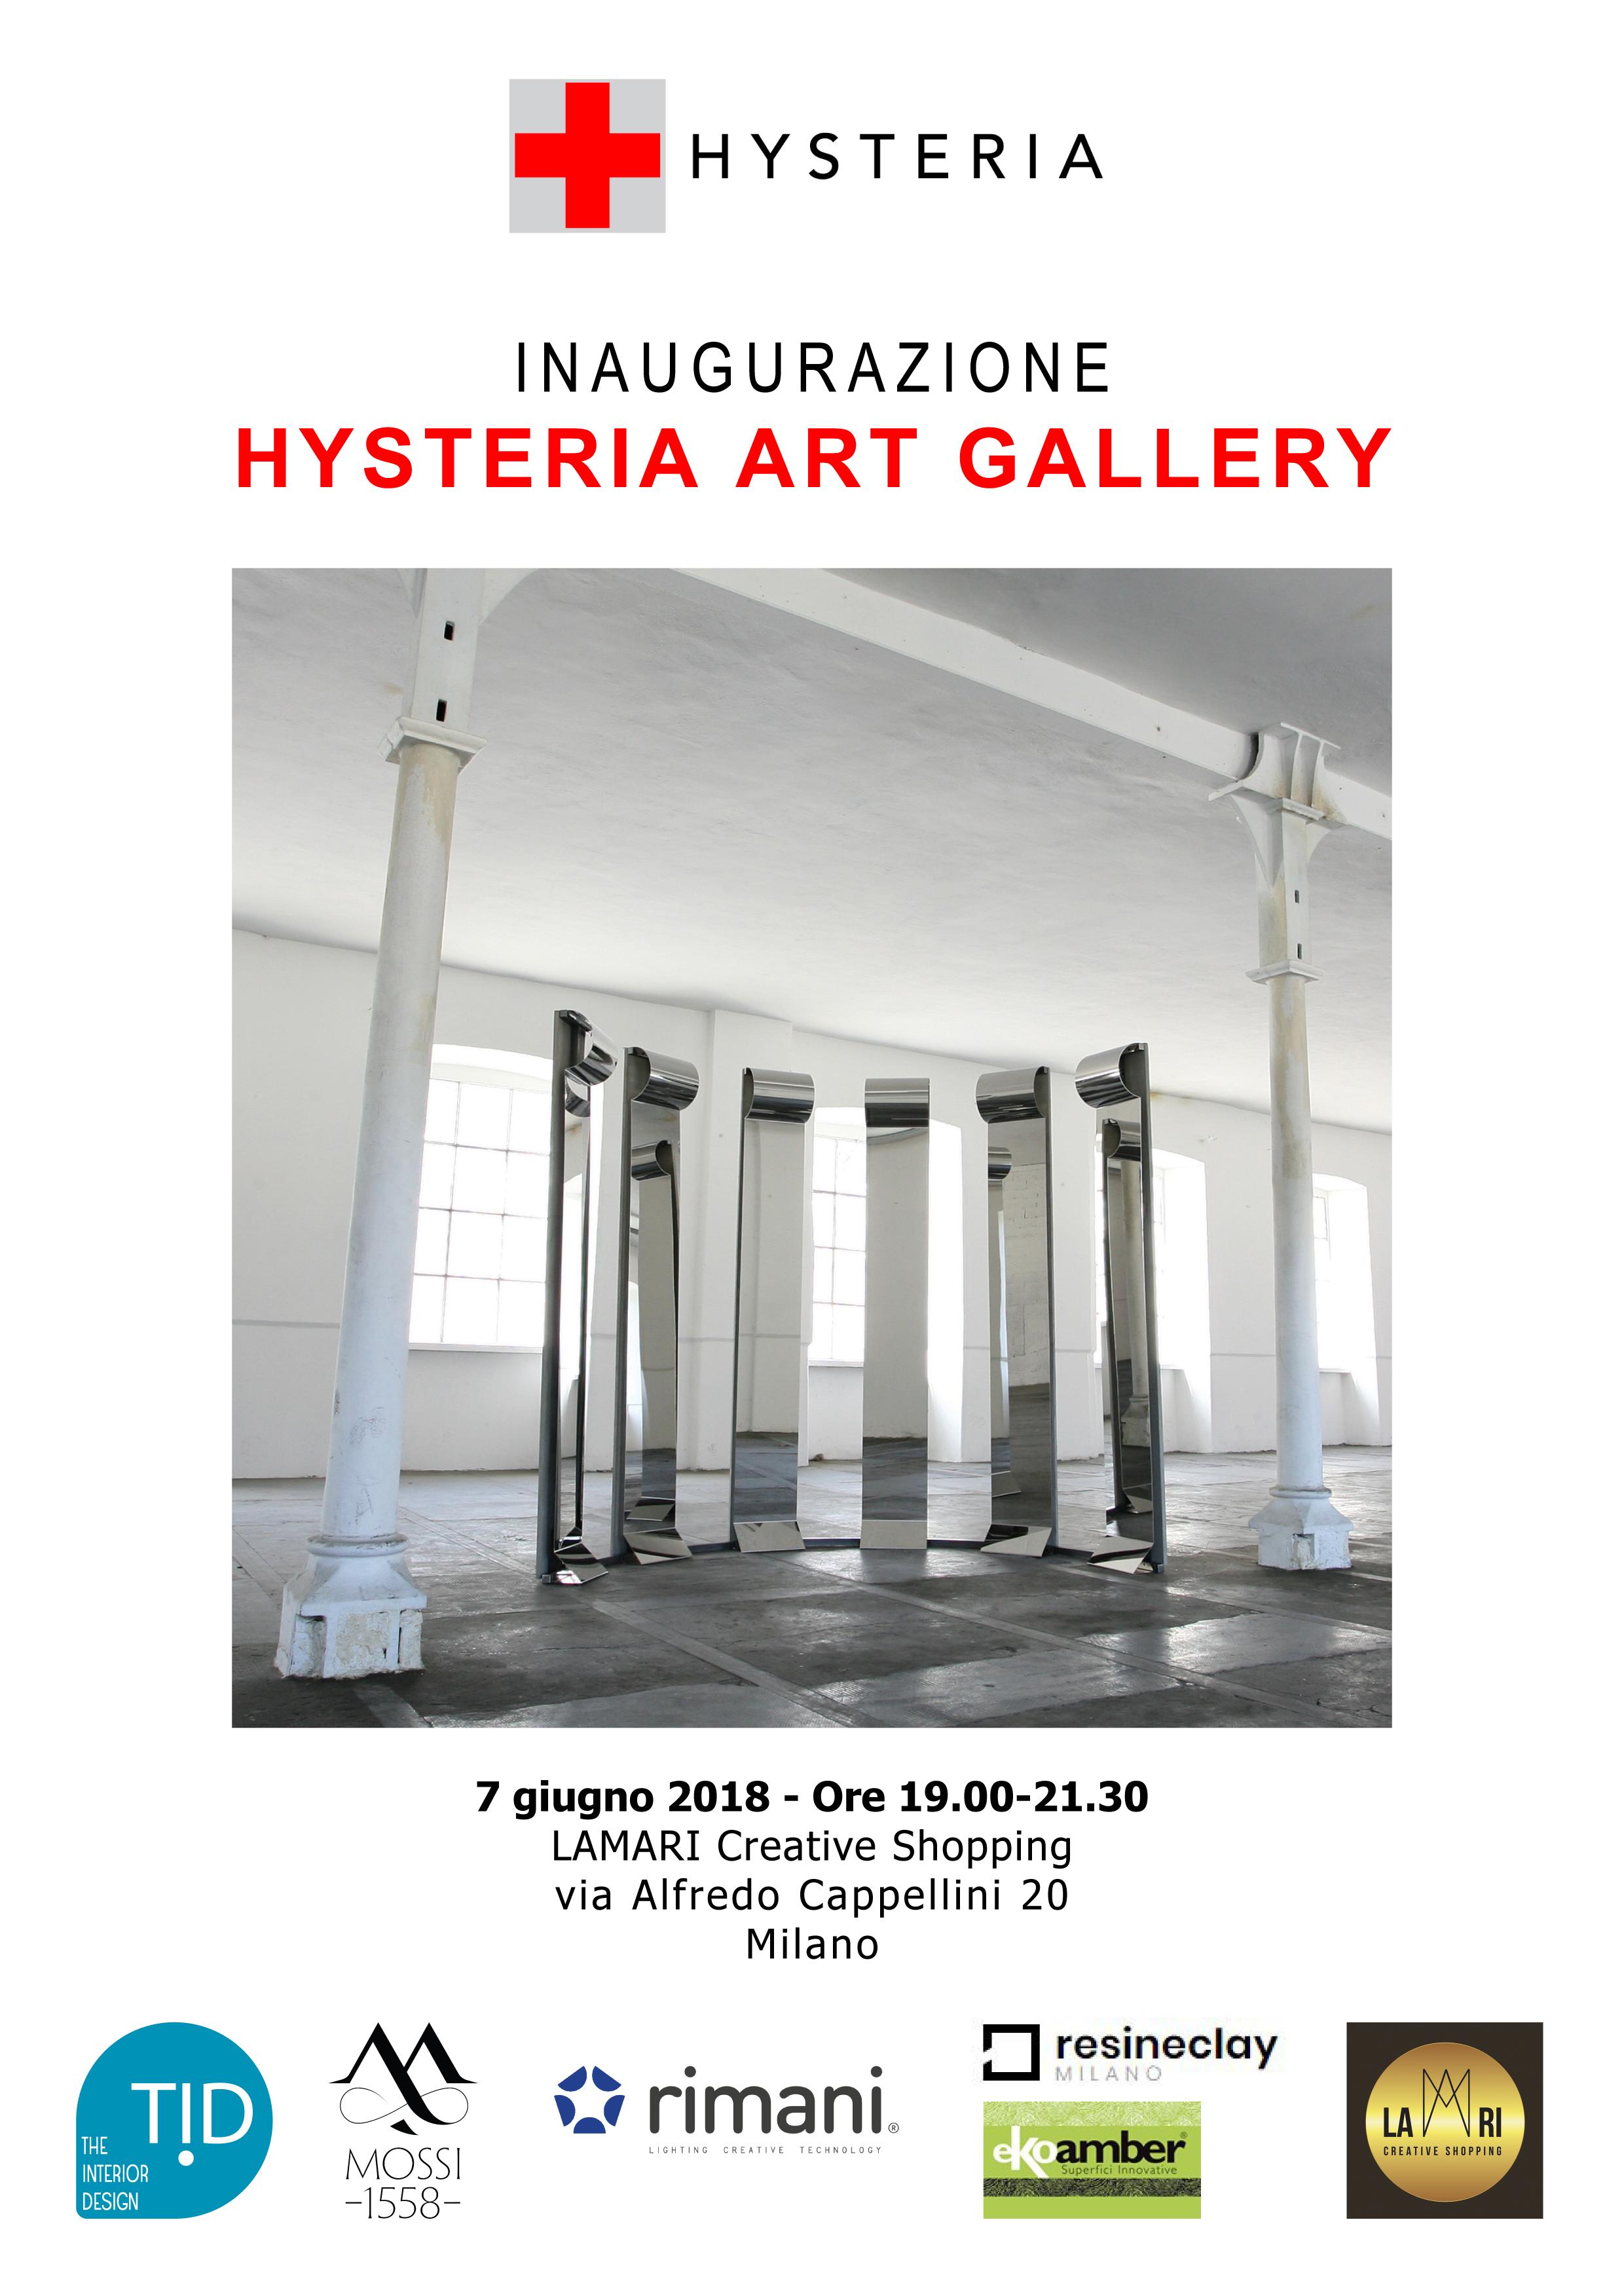 Daniele Basso Hysteria Art Gallery